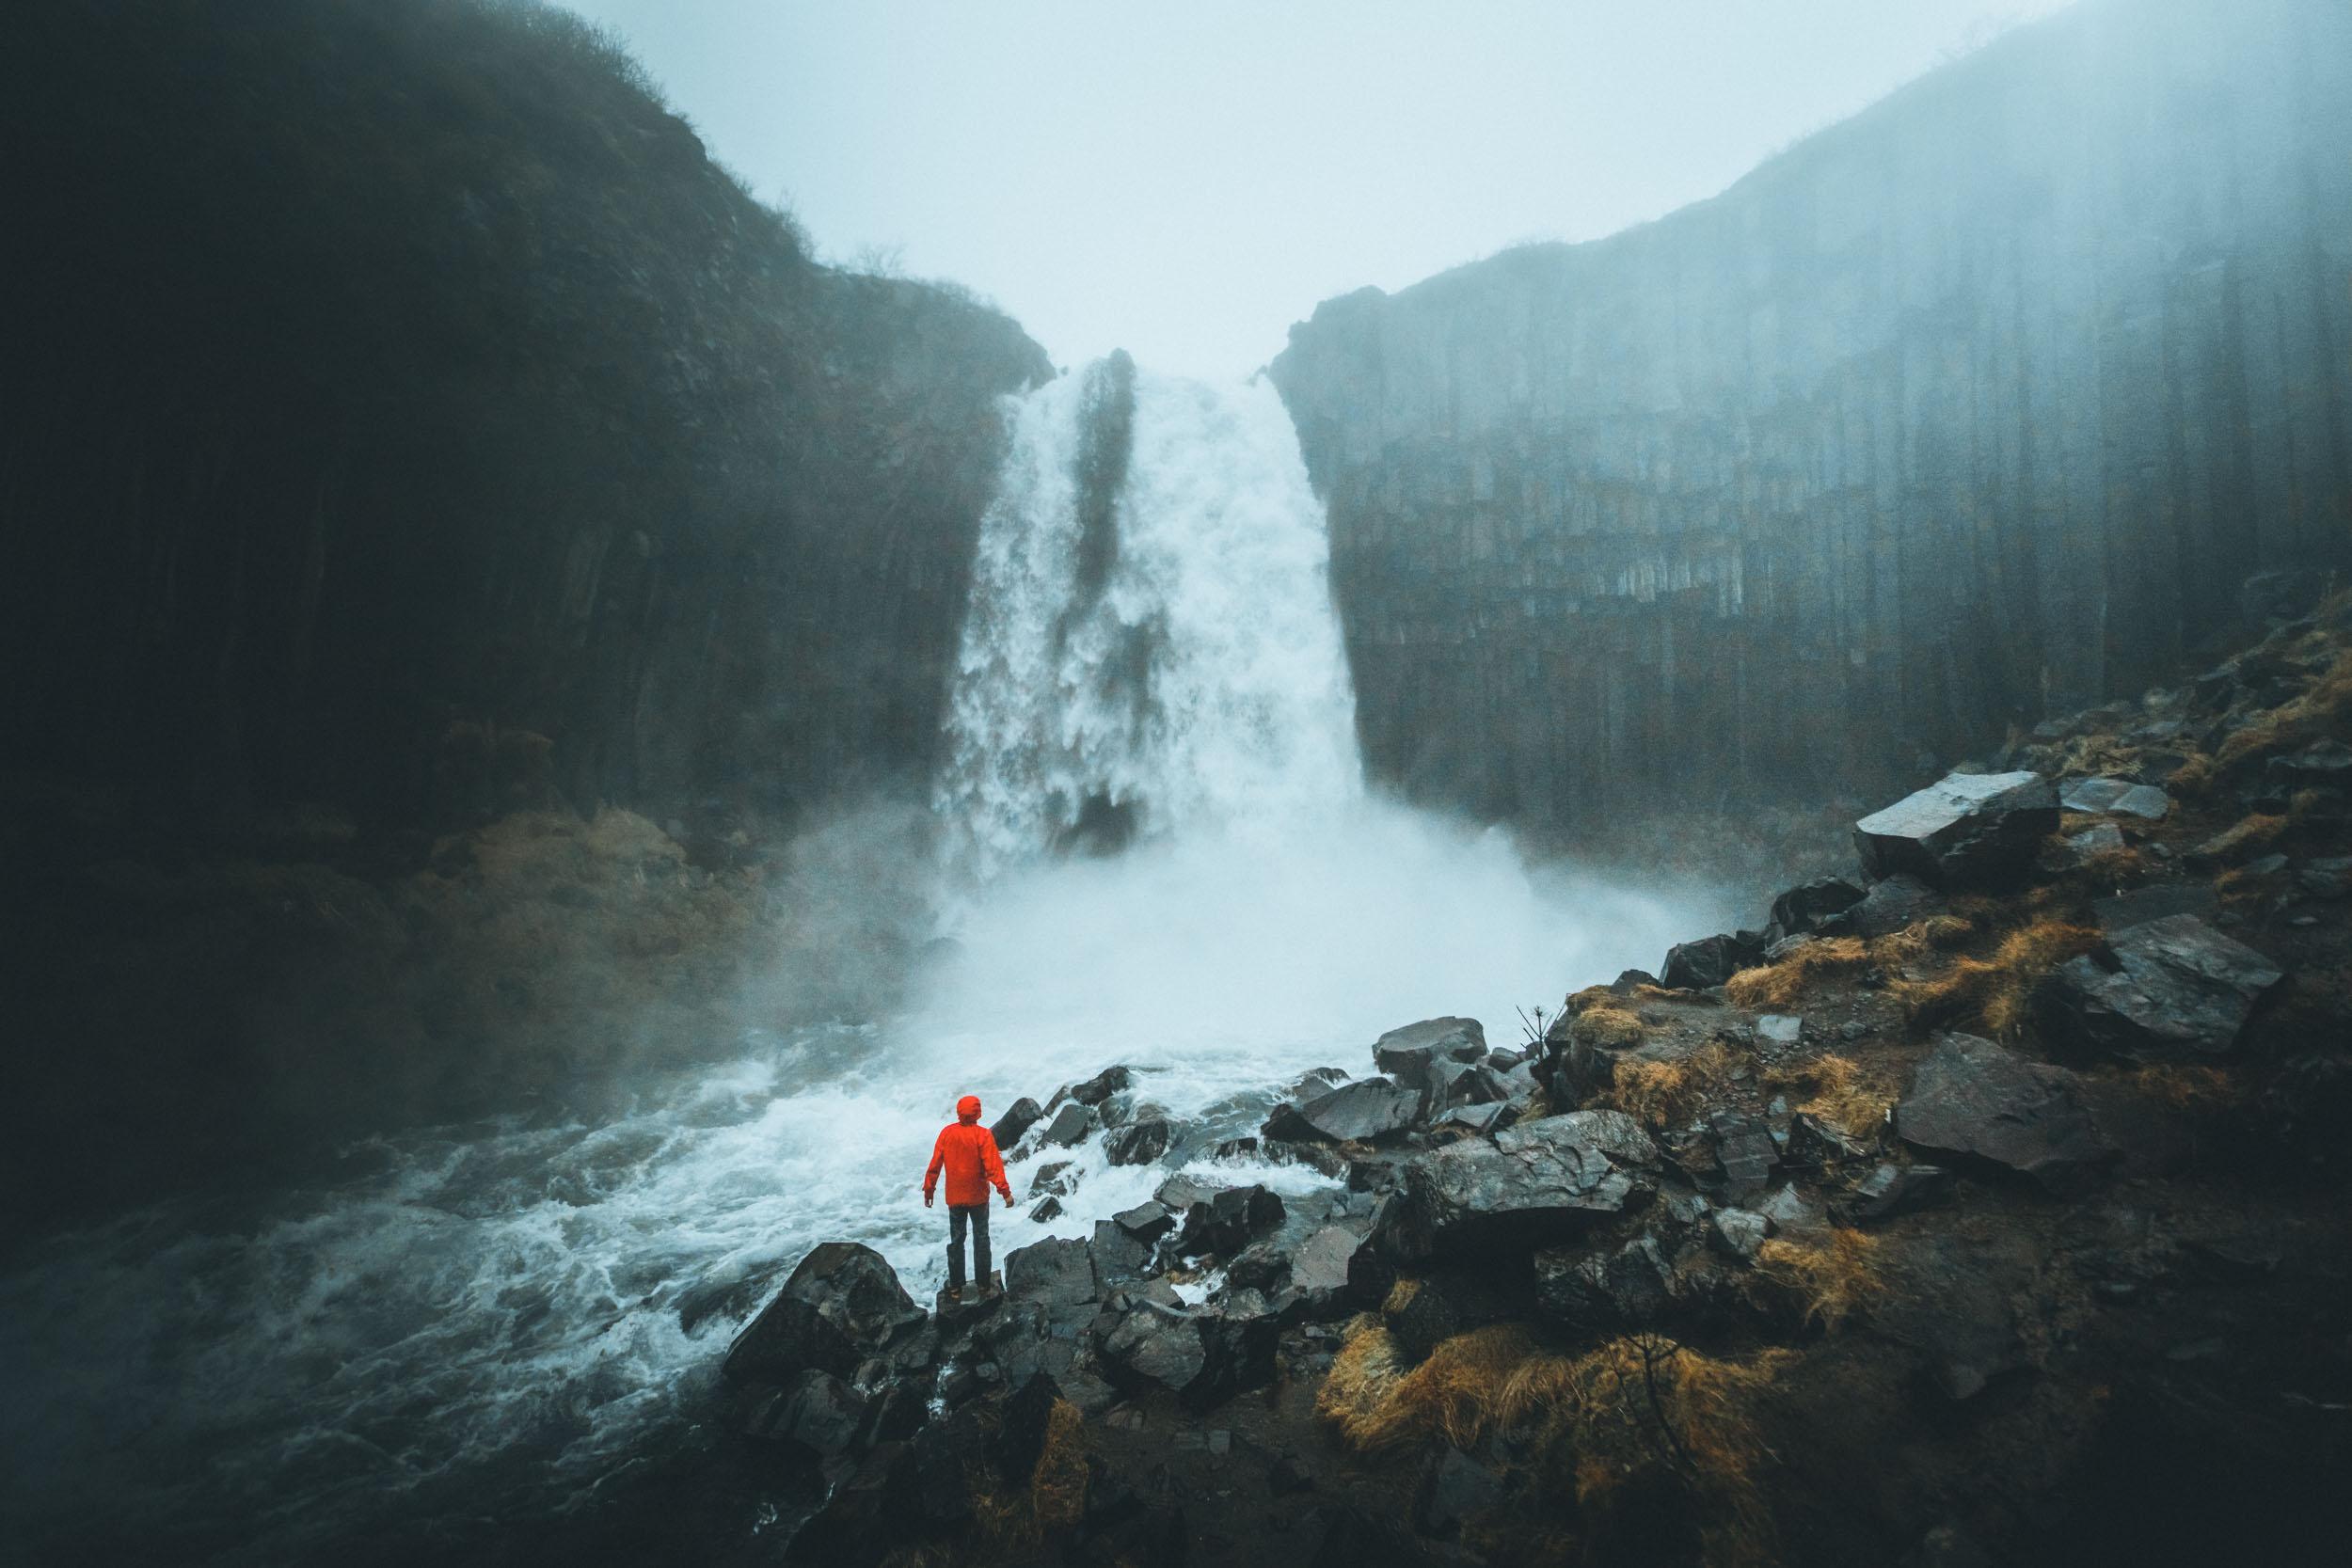 Iceland_Jan_2019_ByTomKahler_Lowres (89 of 262).jpg